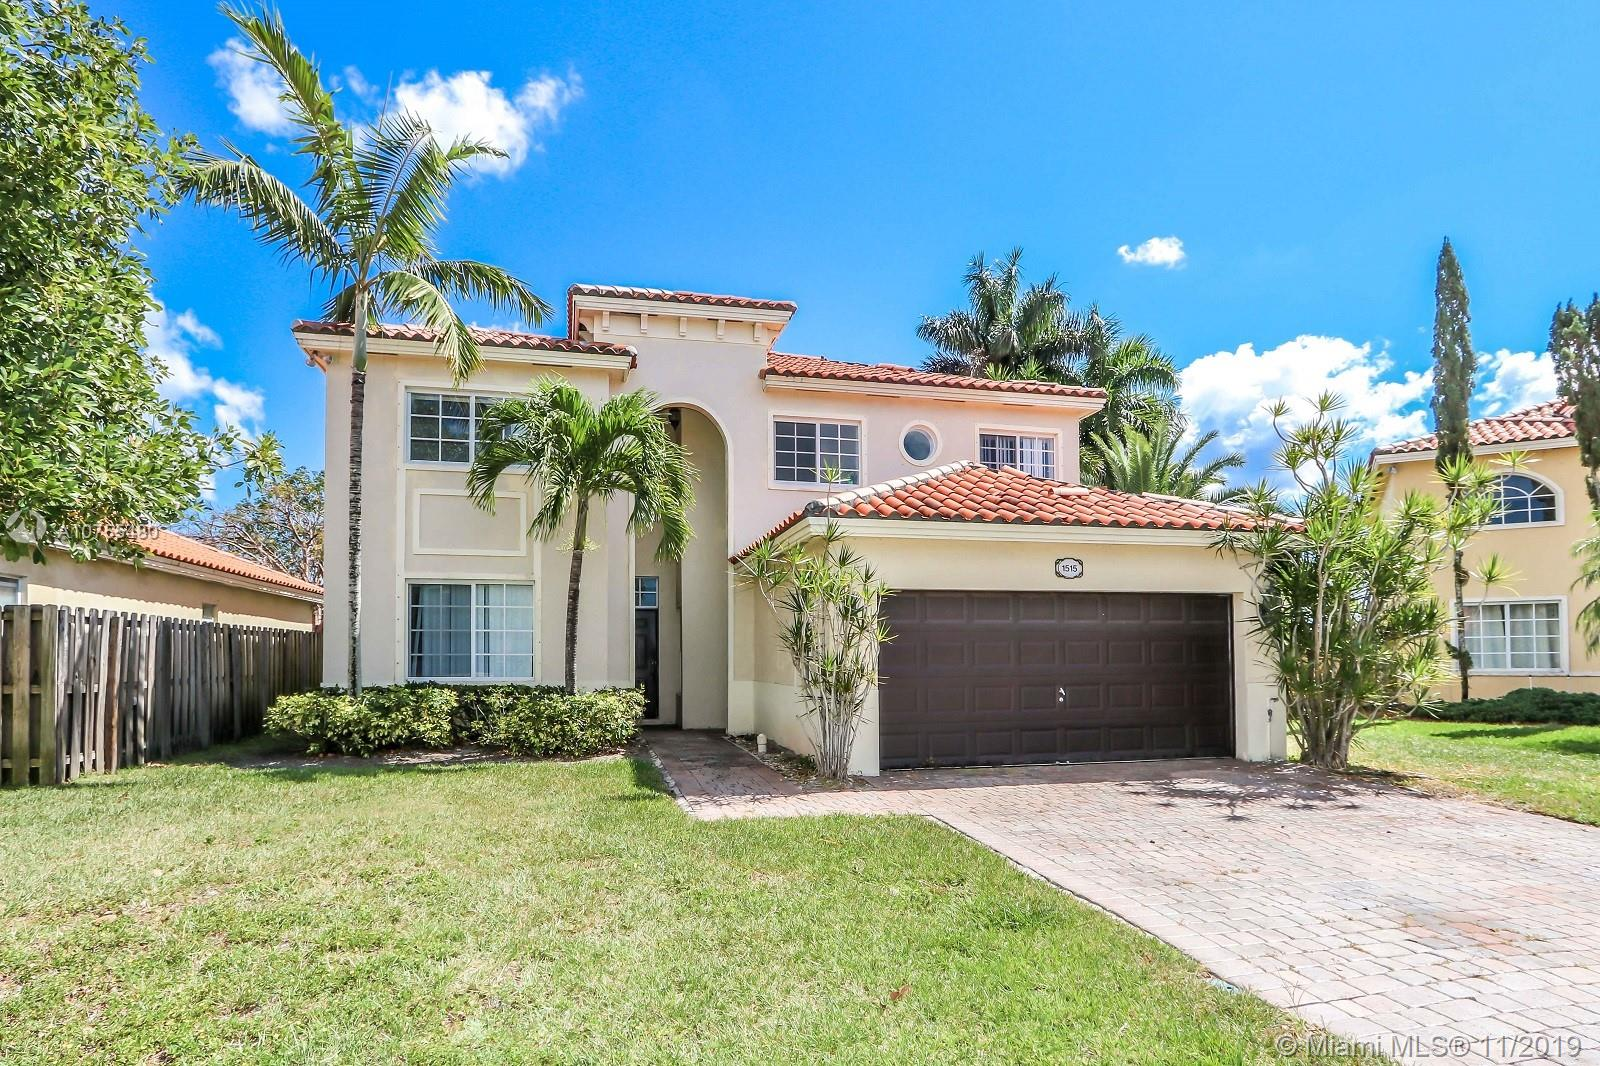 1515 NE 36th Ave, Homestead, FL 33033 - Homestead, FL real estate listing